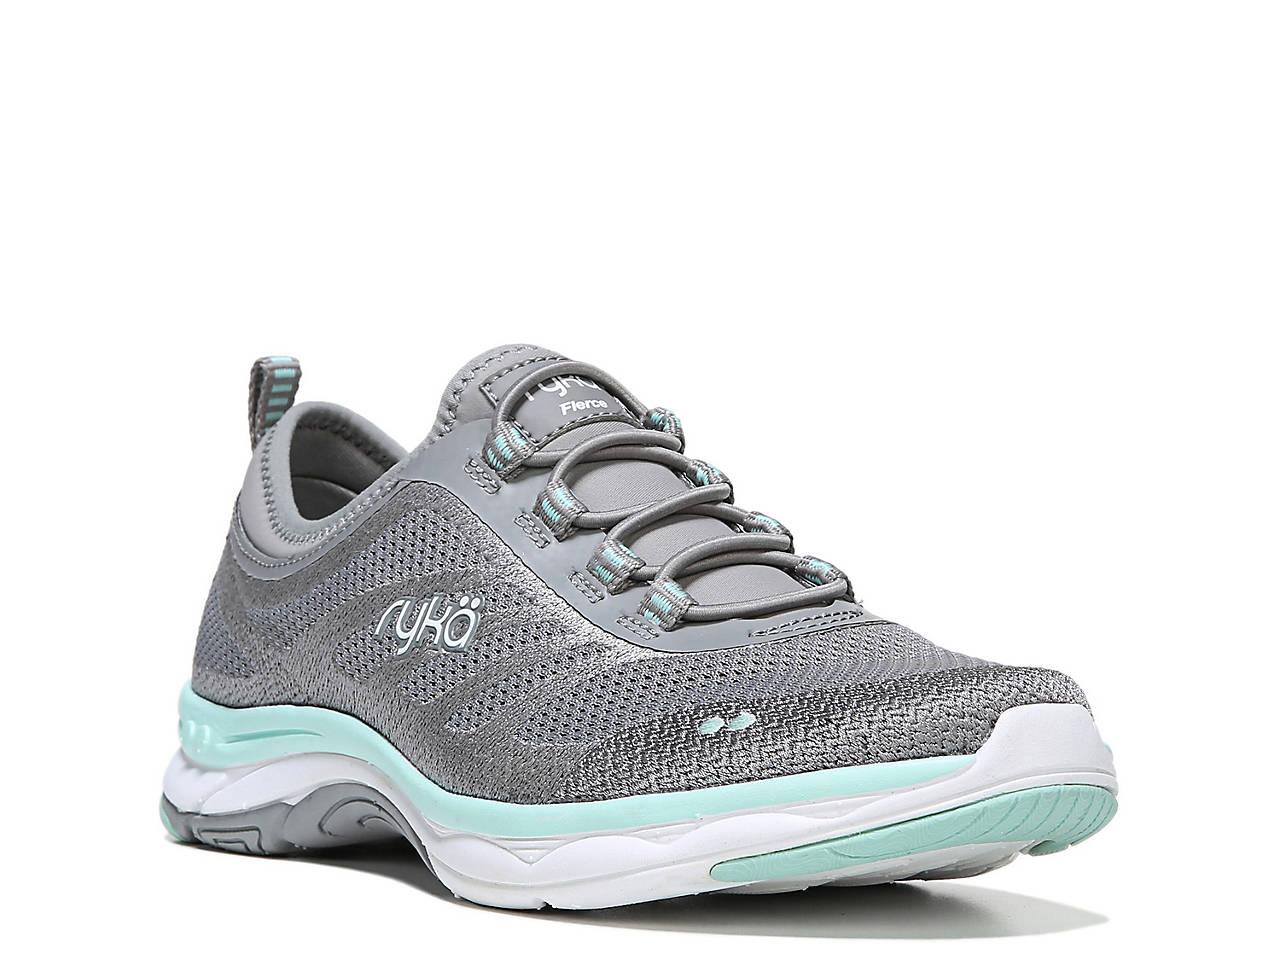 Nyeste adidas Originals Menn Sko Sneakers SAMBA RM Hjerte